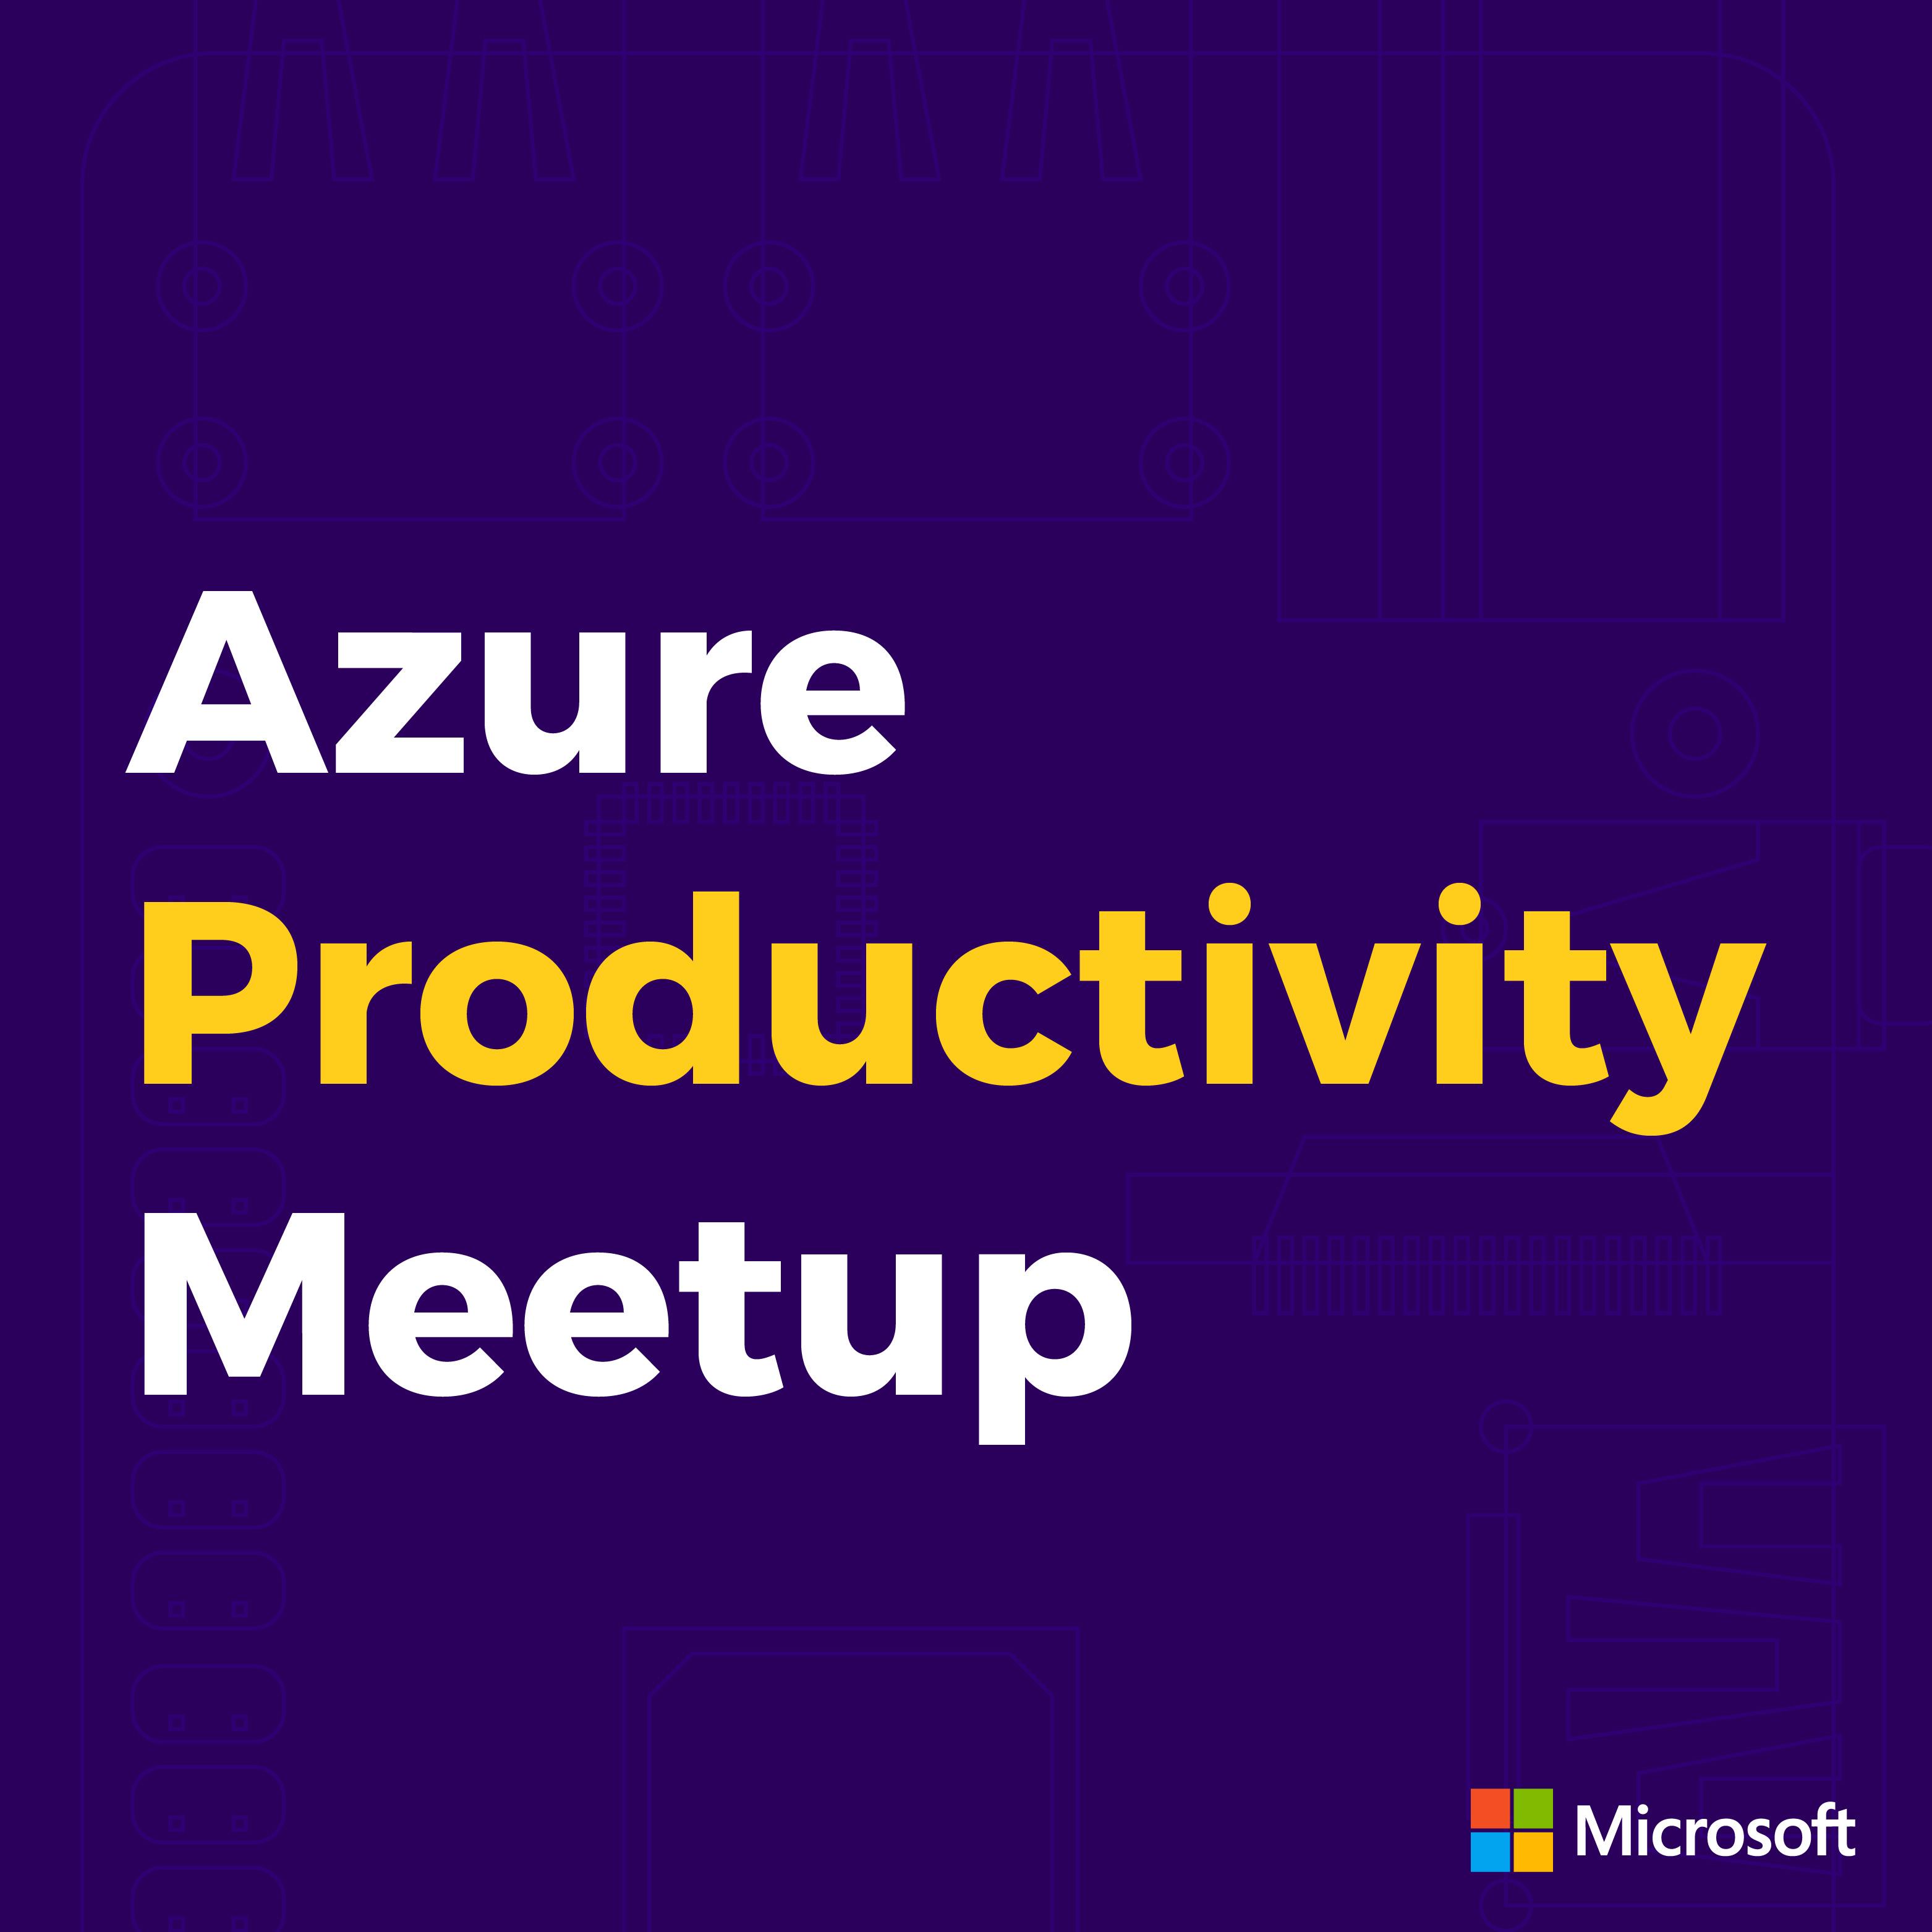 Azure Productivity Meetup